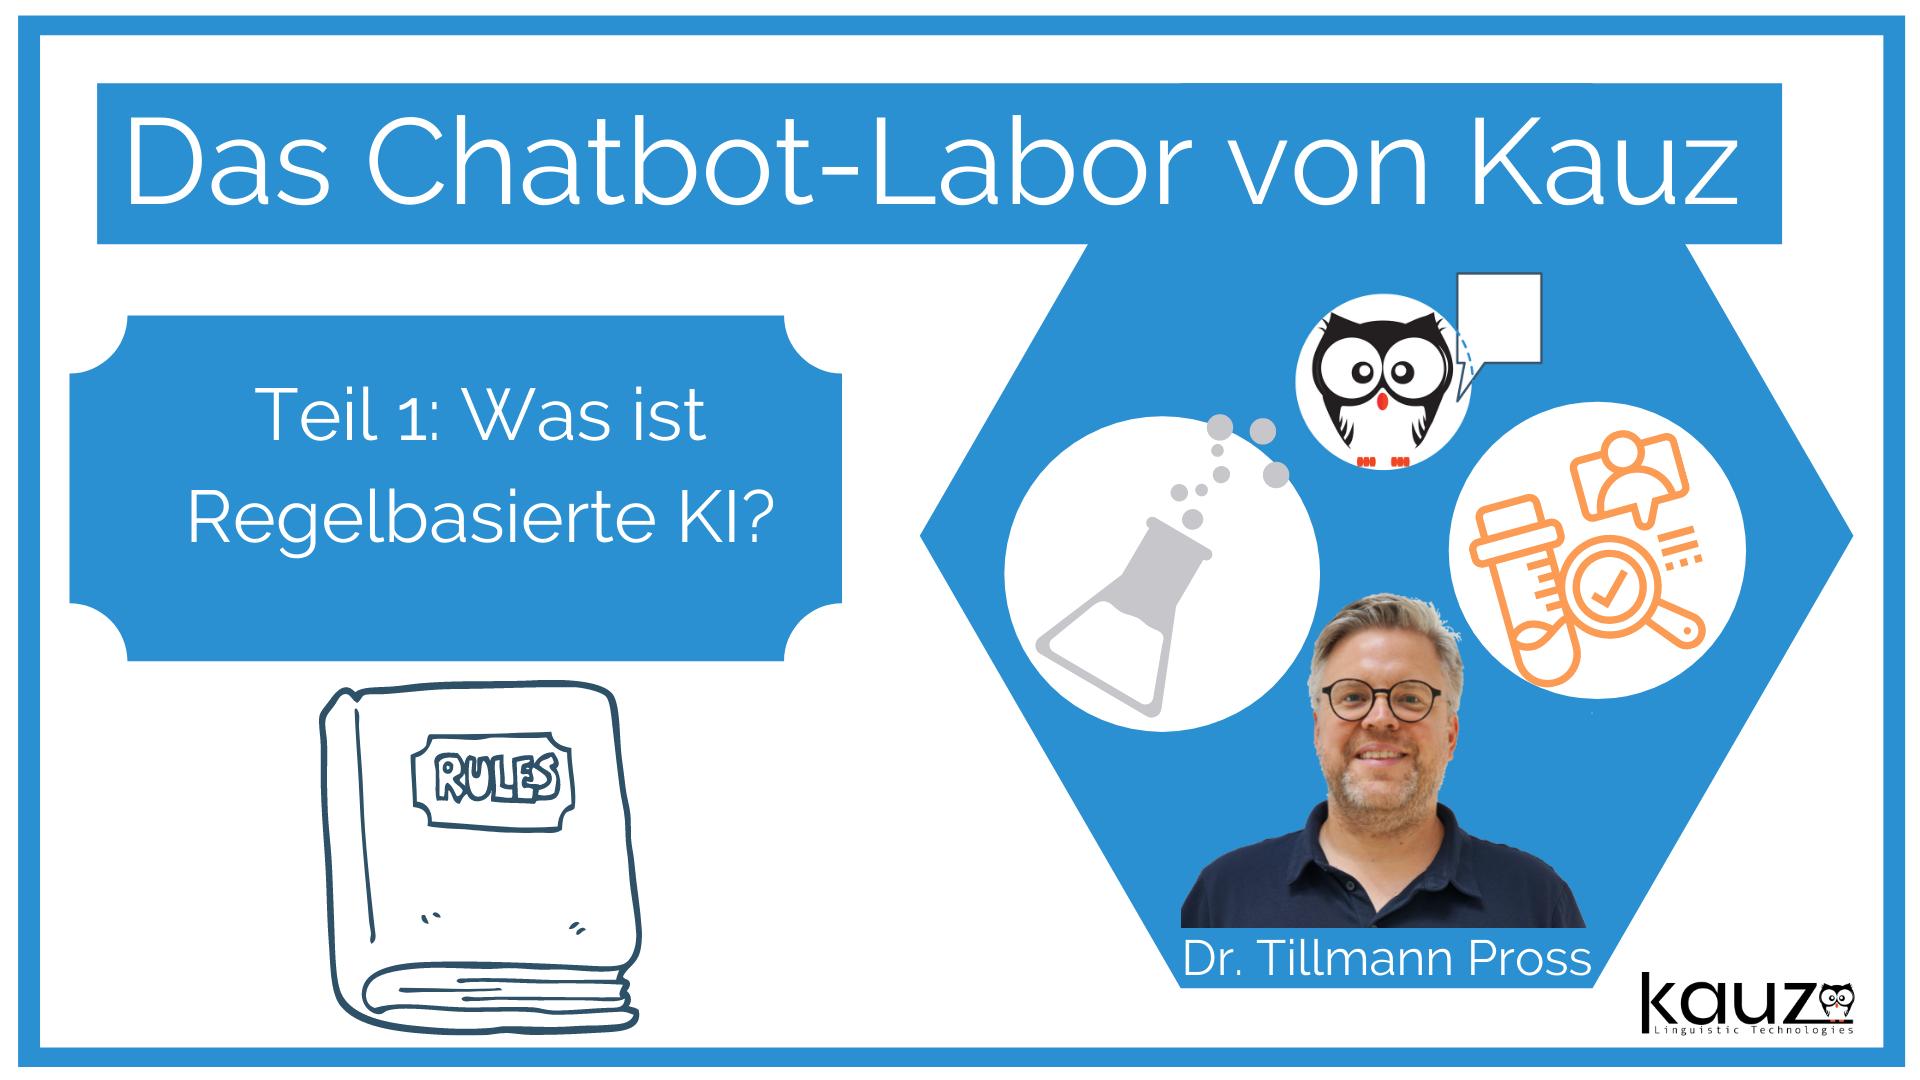 Chatbot Labor Kauz Regelbasierte Ki